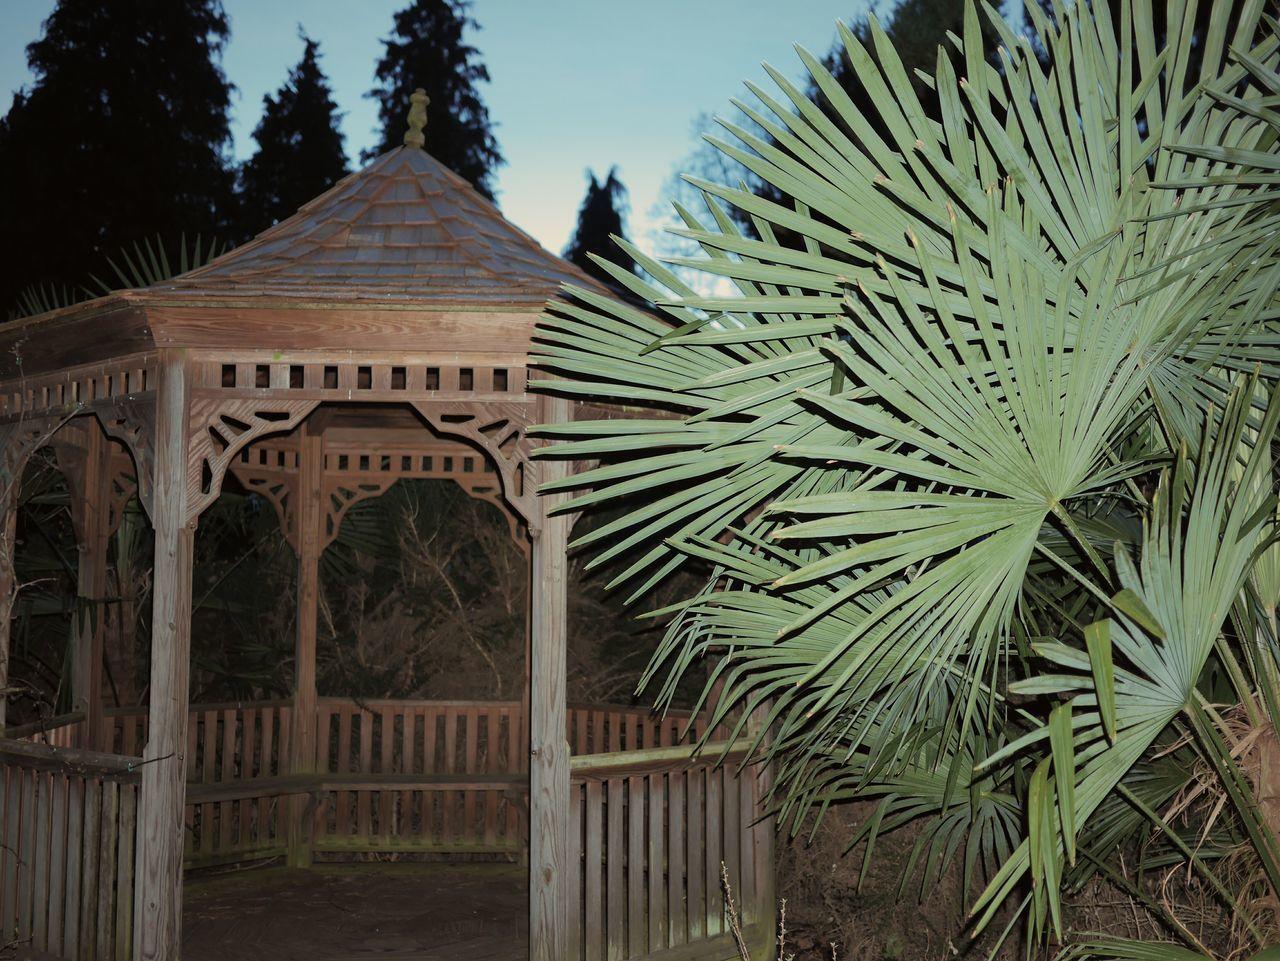 Tree Architecture Built Structure Building Exterior No People Outdoors Plant Nature Minimal Minimalism Beauty In Nature Arboretum Bokrijk